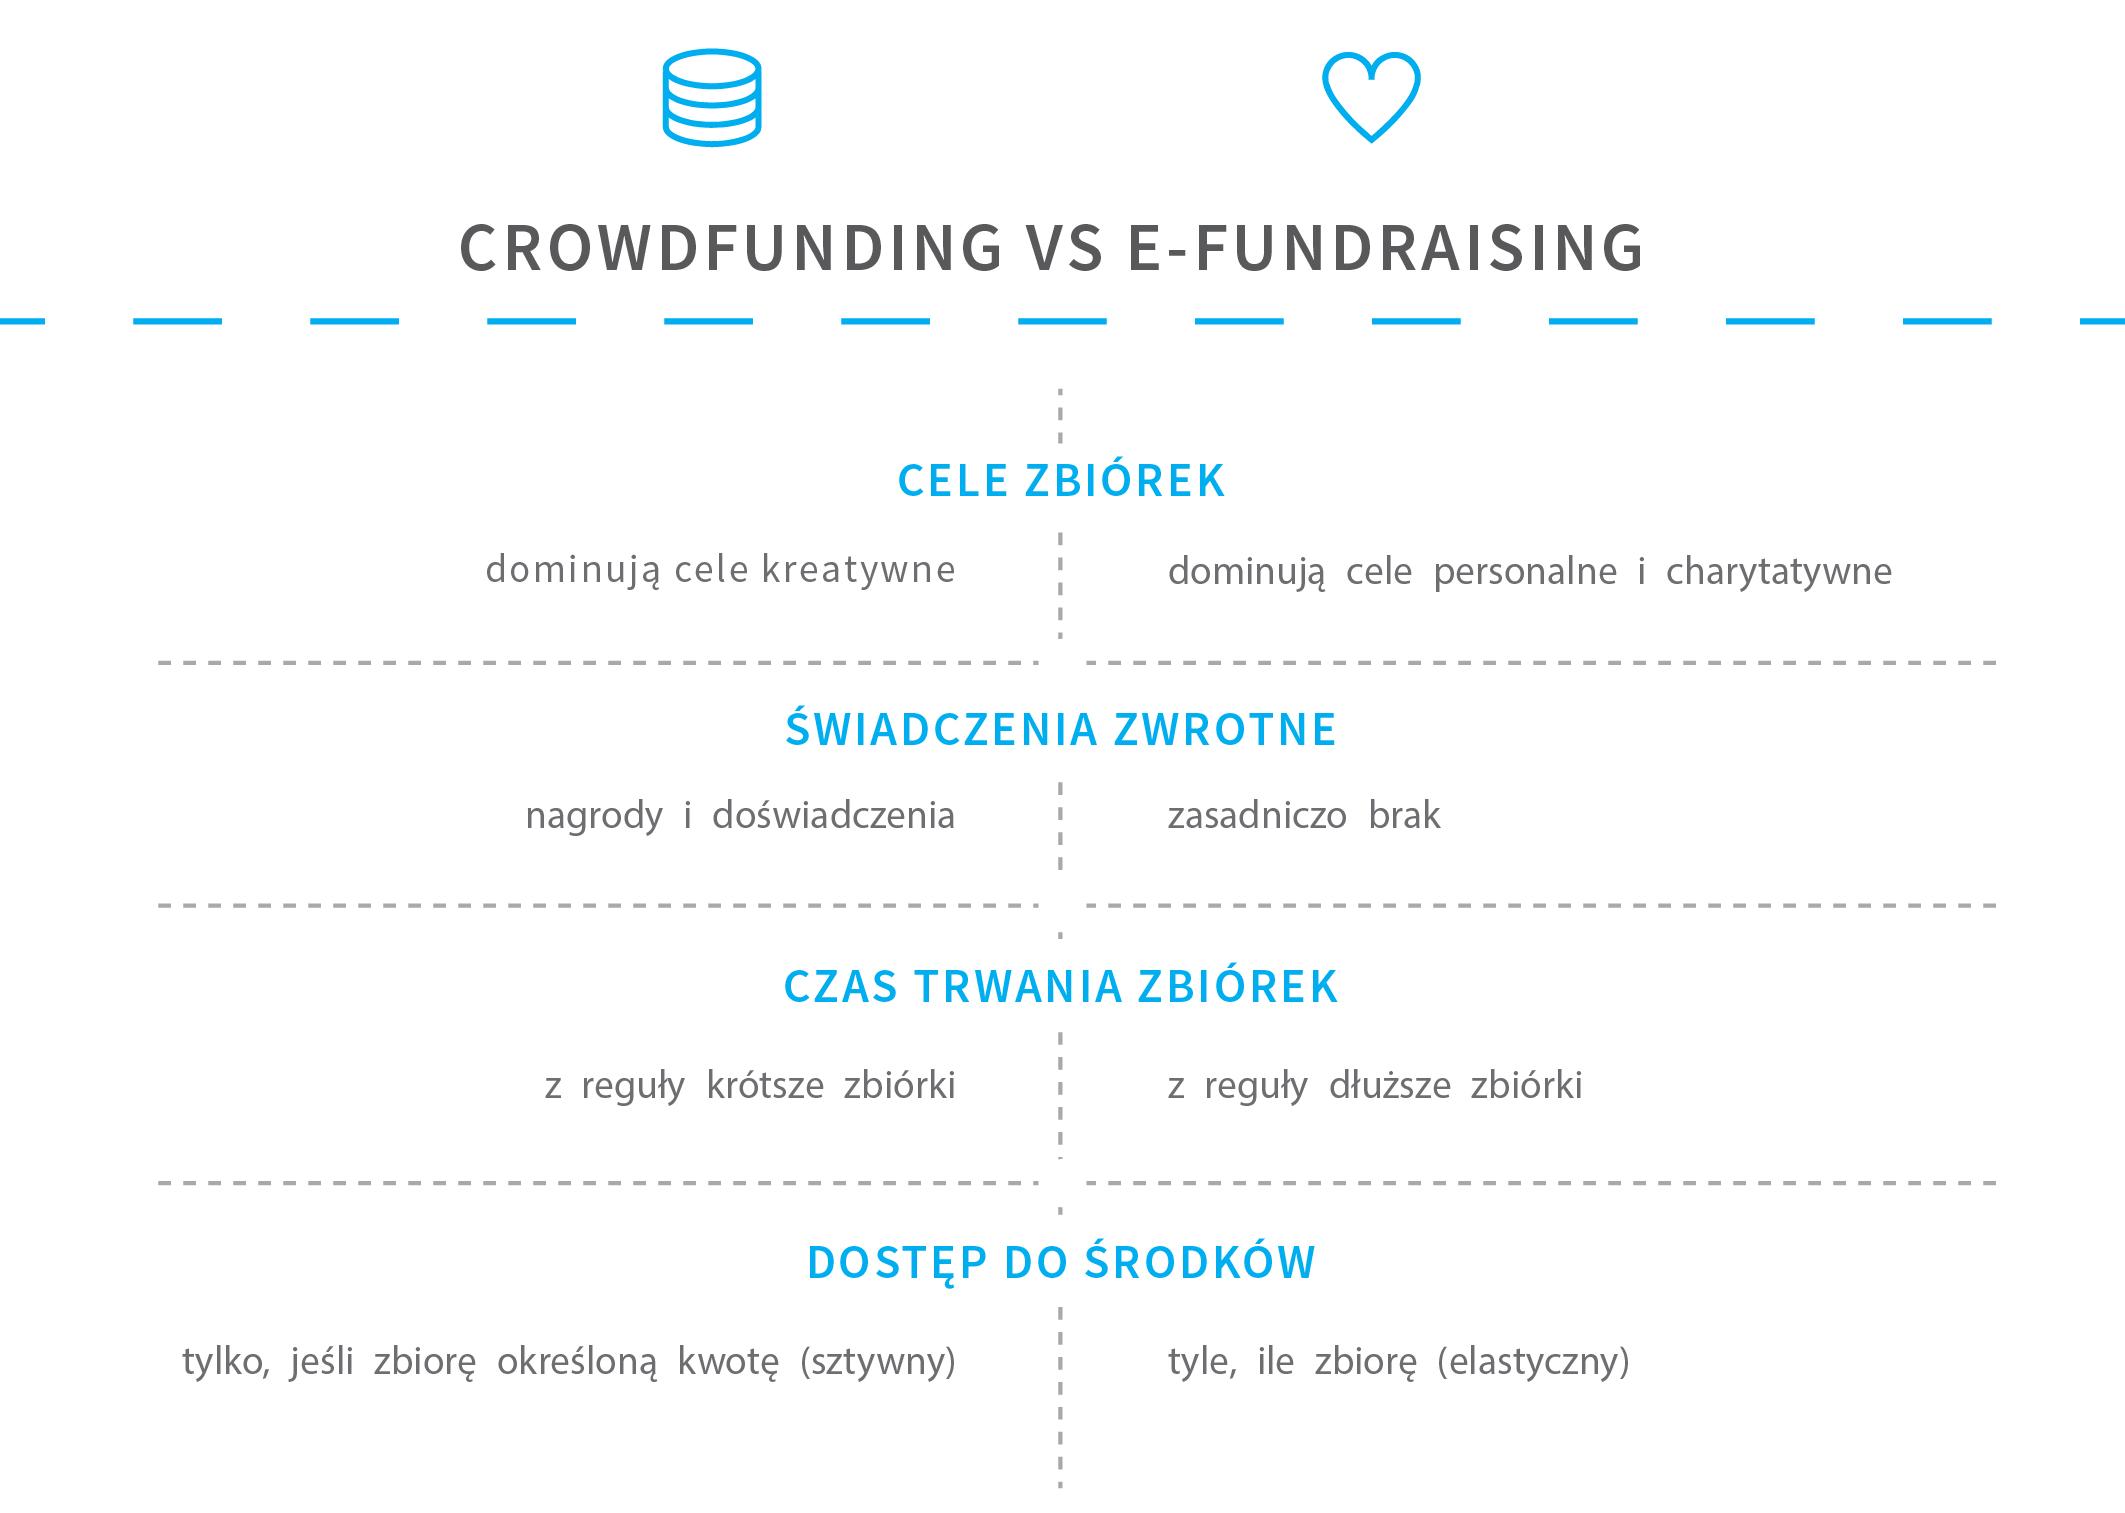 zrzutka_crowdfunding_vs_efundraising-02